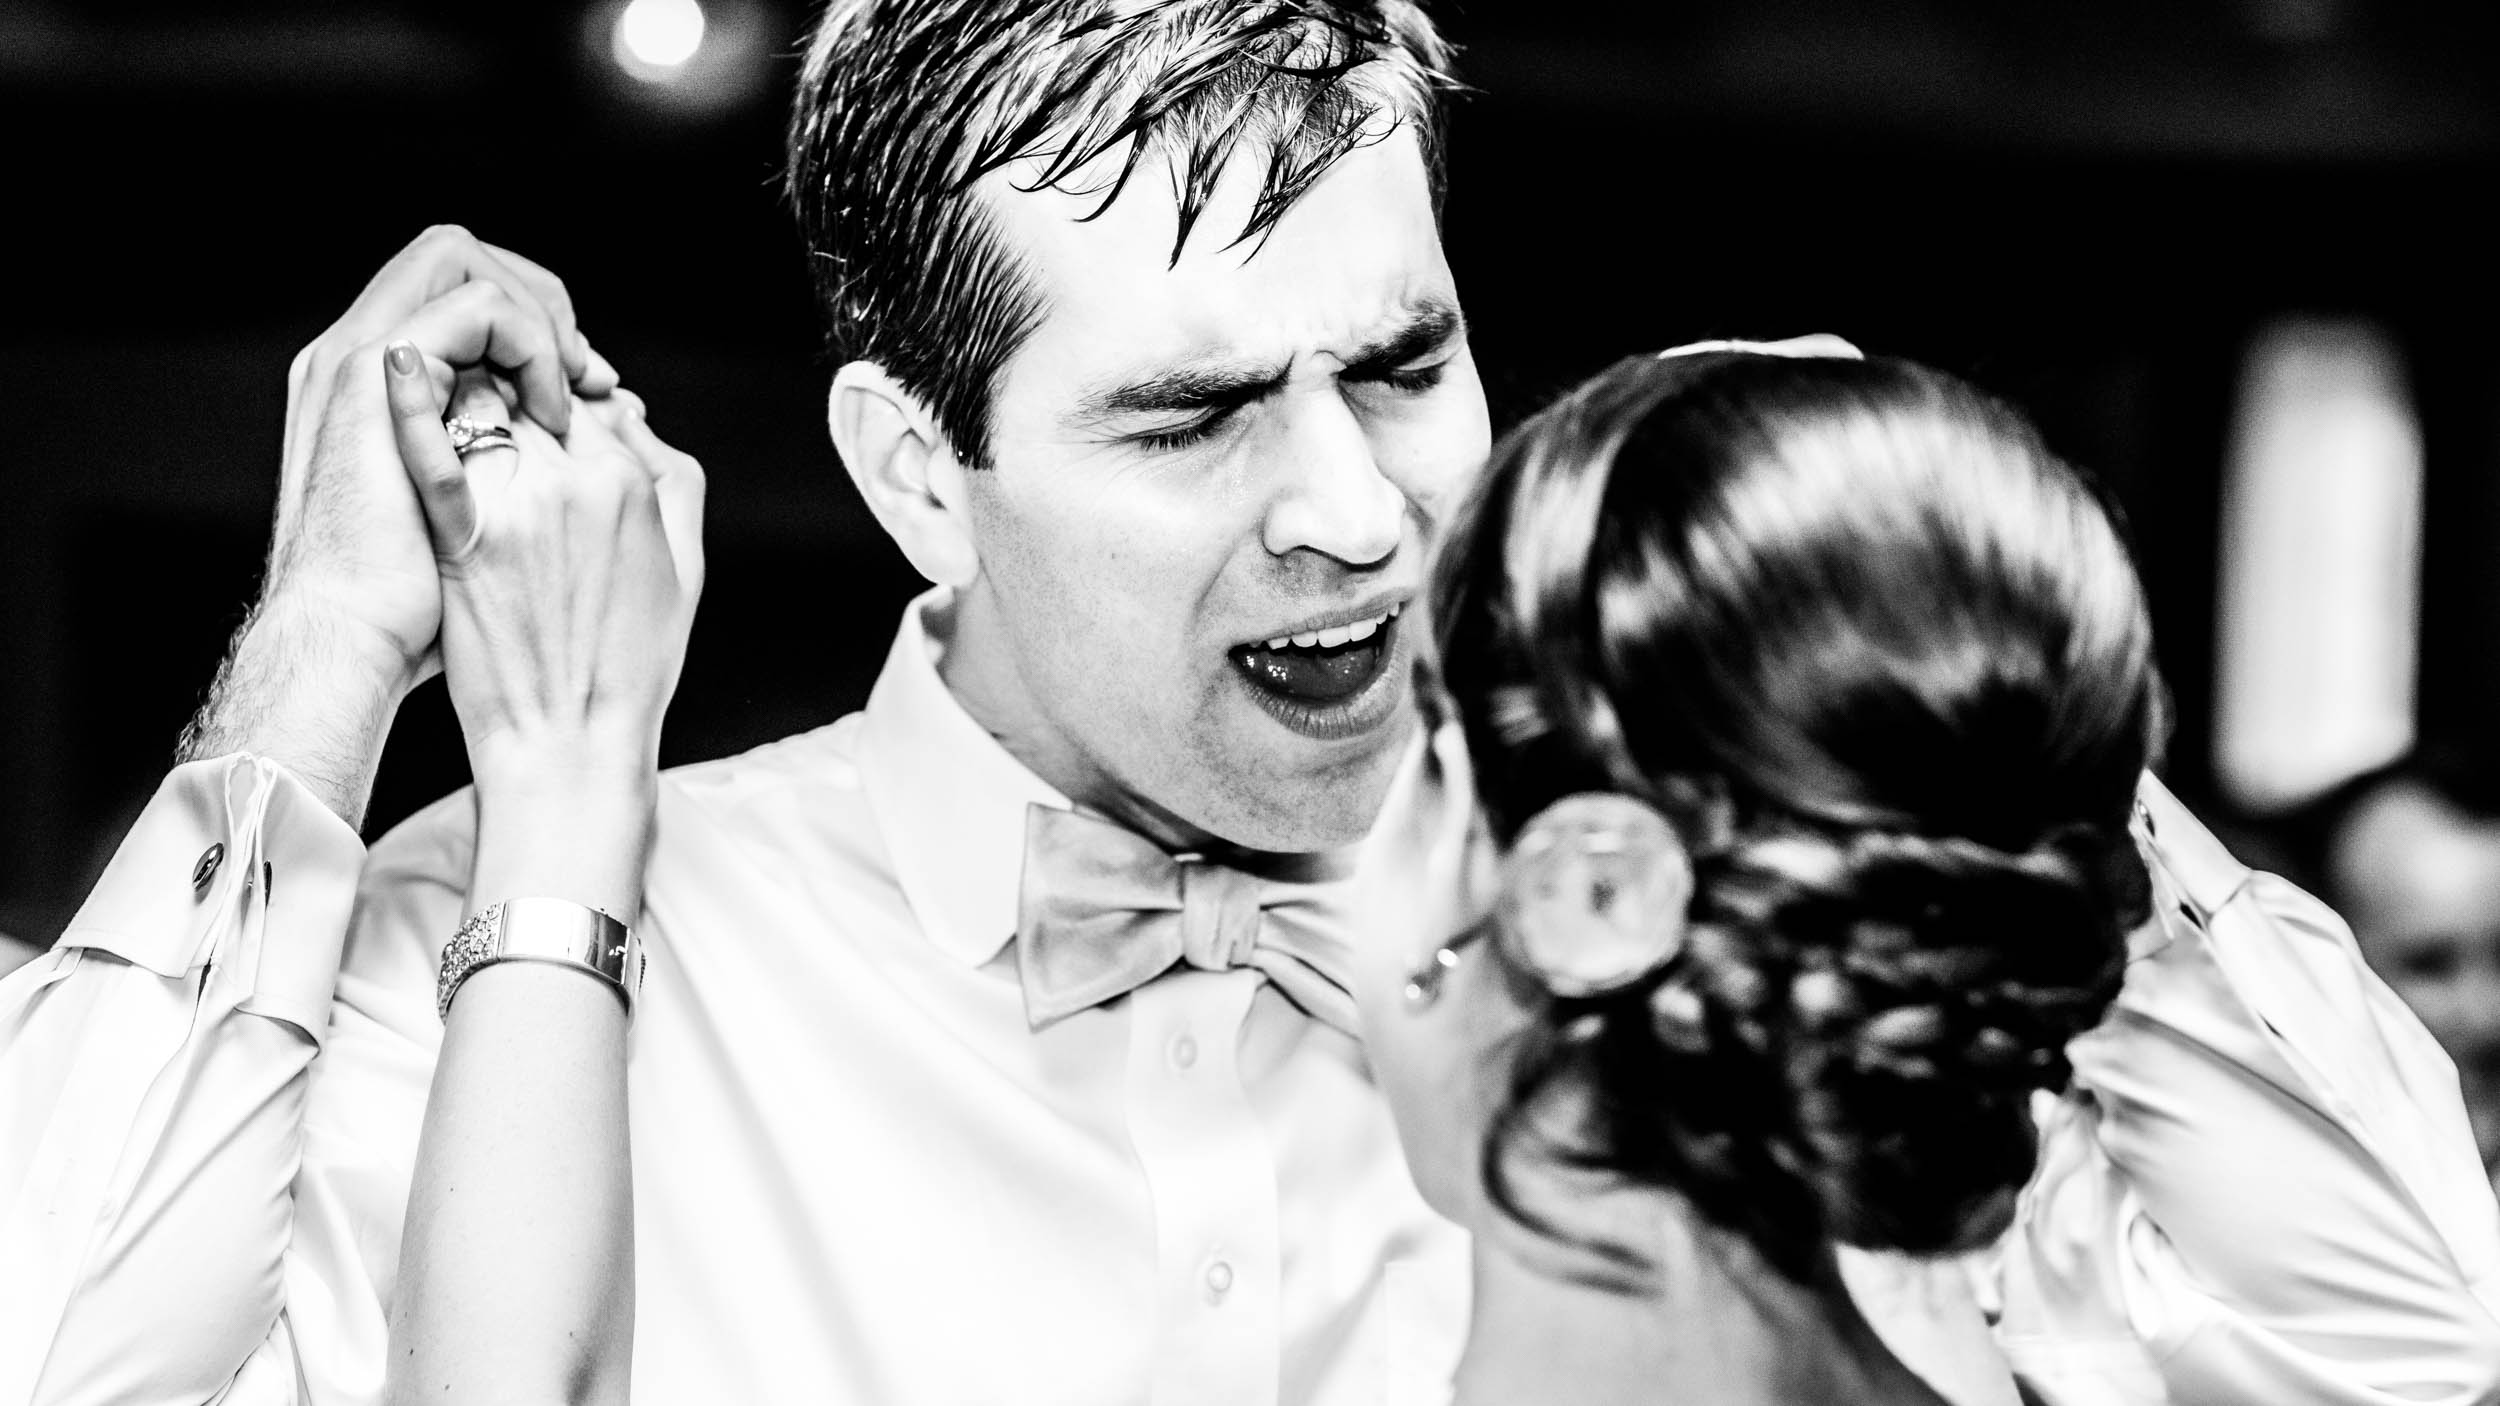 dc+metro+wedding+photographer+vadym+guliuk+photography+wedding+reception-2033.jpg